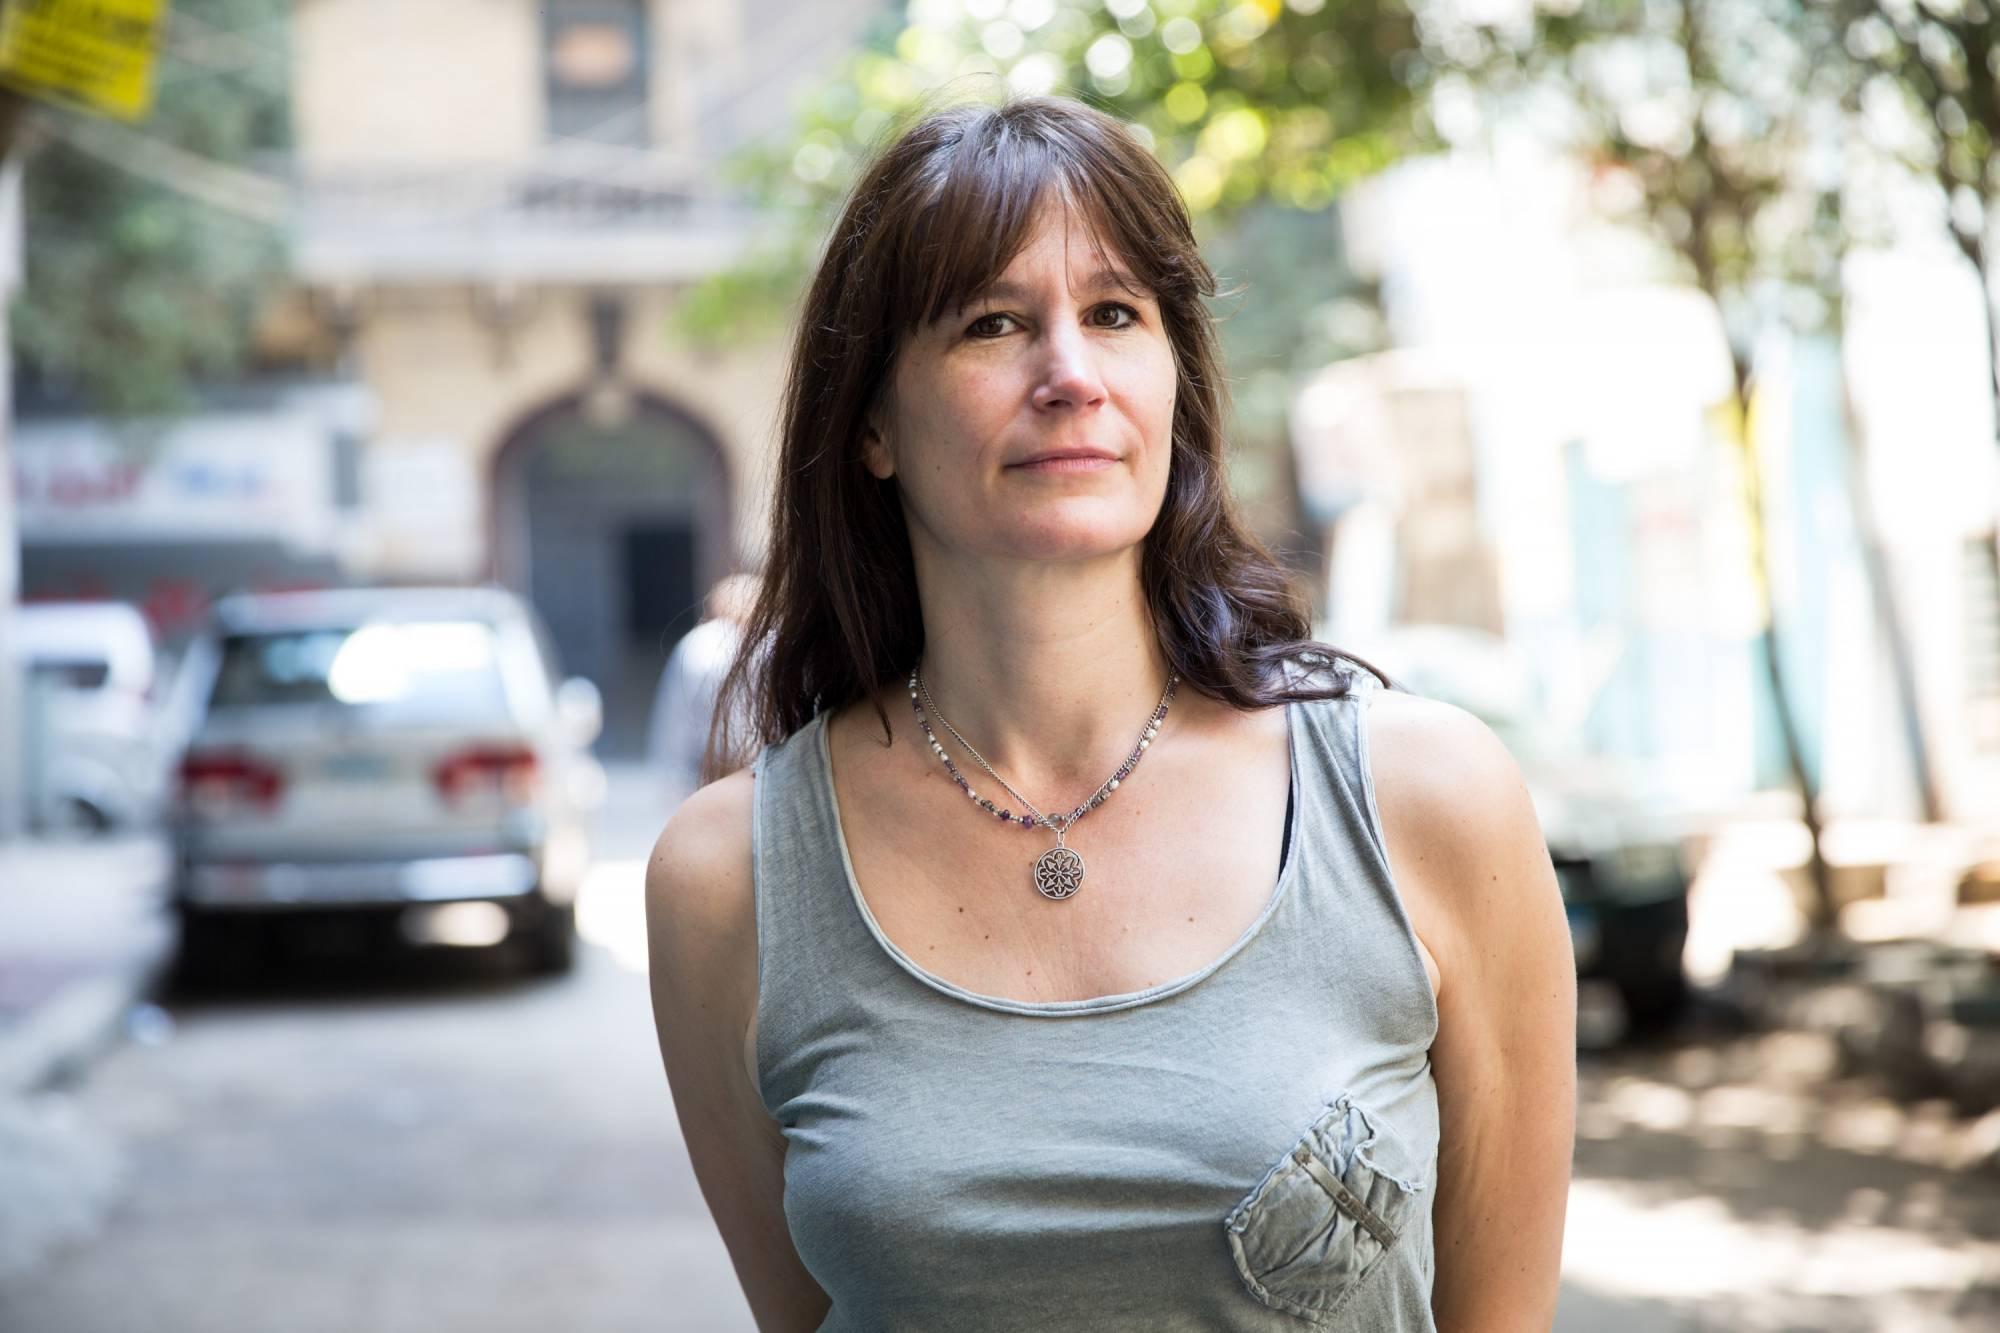 Nicole Seiler, Cairo, 2017 (Image: Mostafa Abdel Aty)